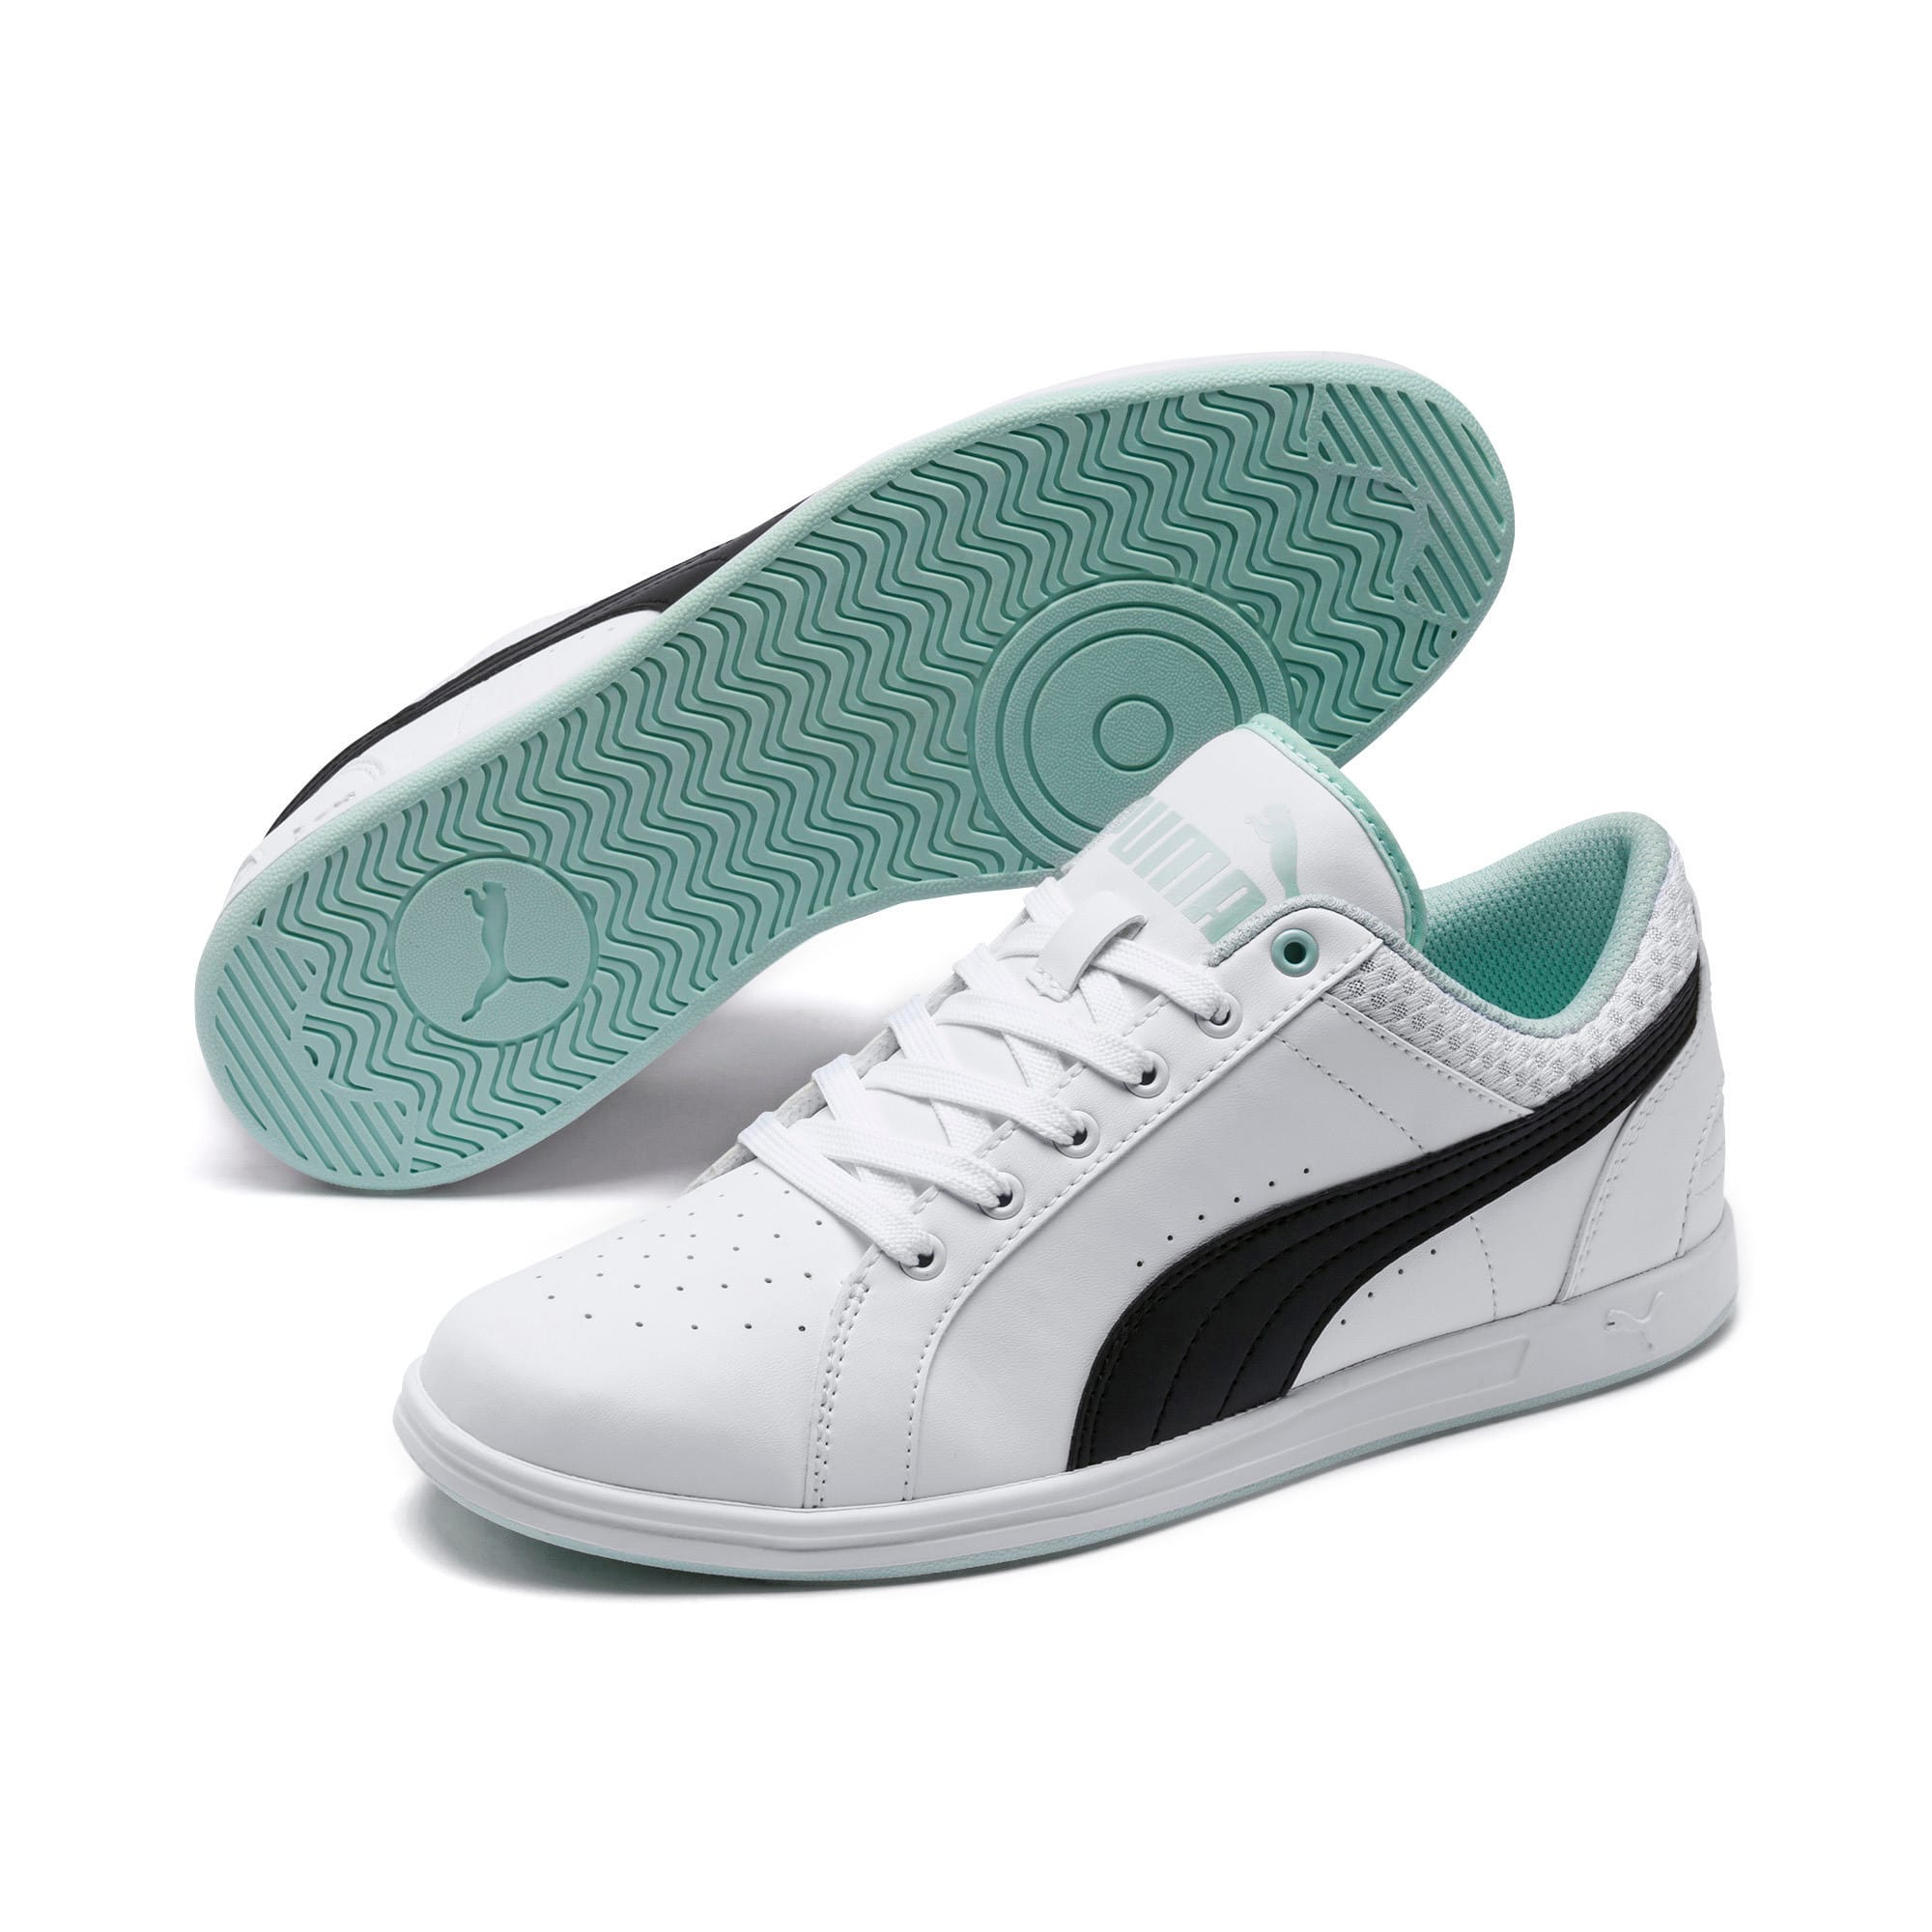 Thumbnail 2 of Ikaz Lo v2 Women's Sneakers, Puma White-Puma Black-, medium-IND